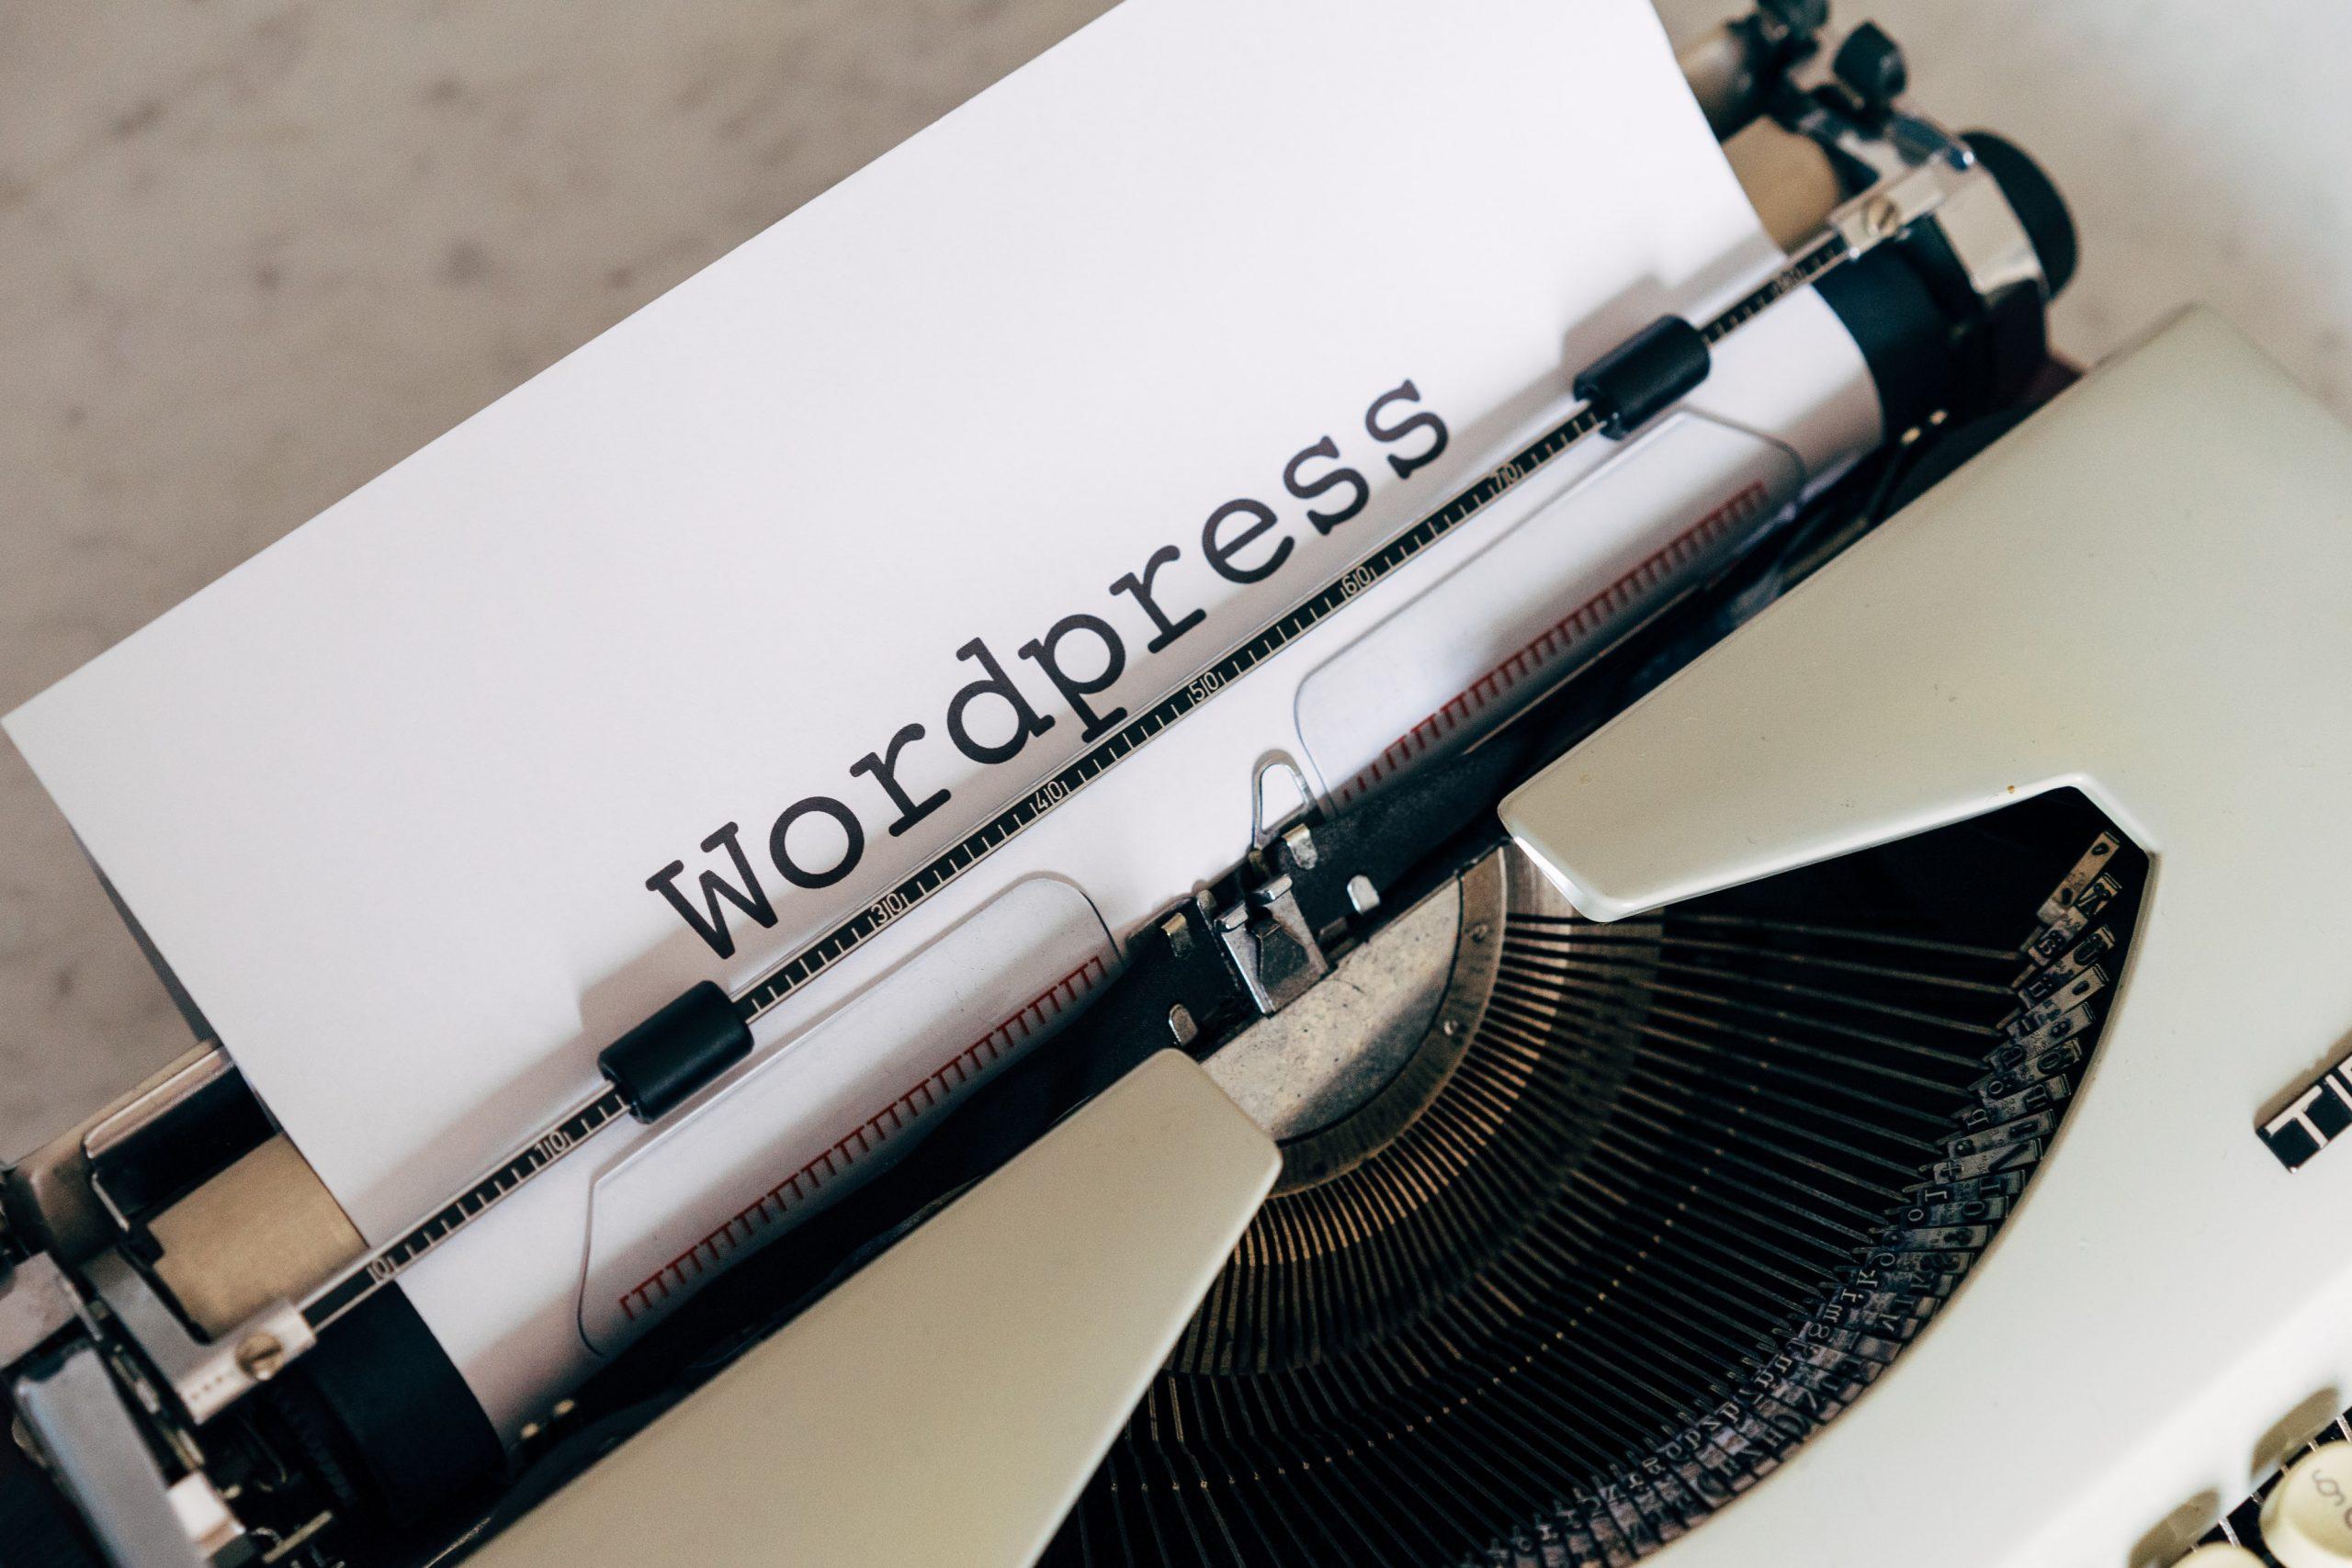 wordpress white screen of death, WP Editor